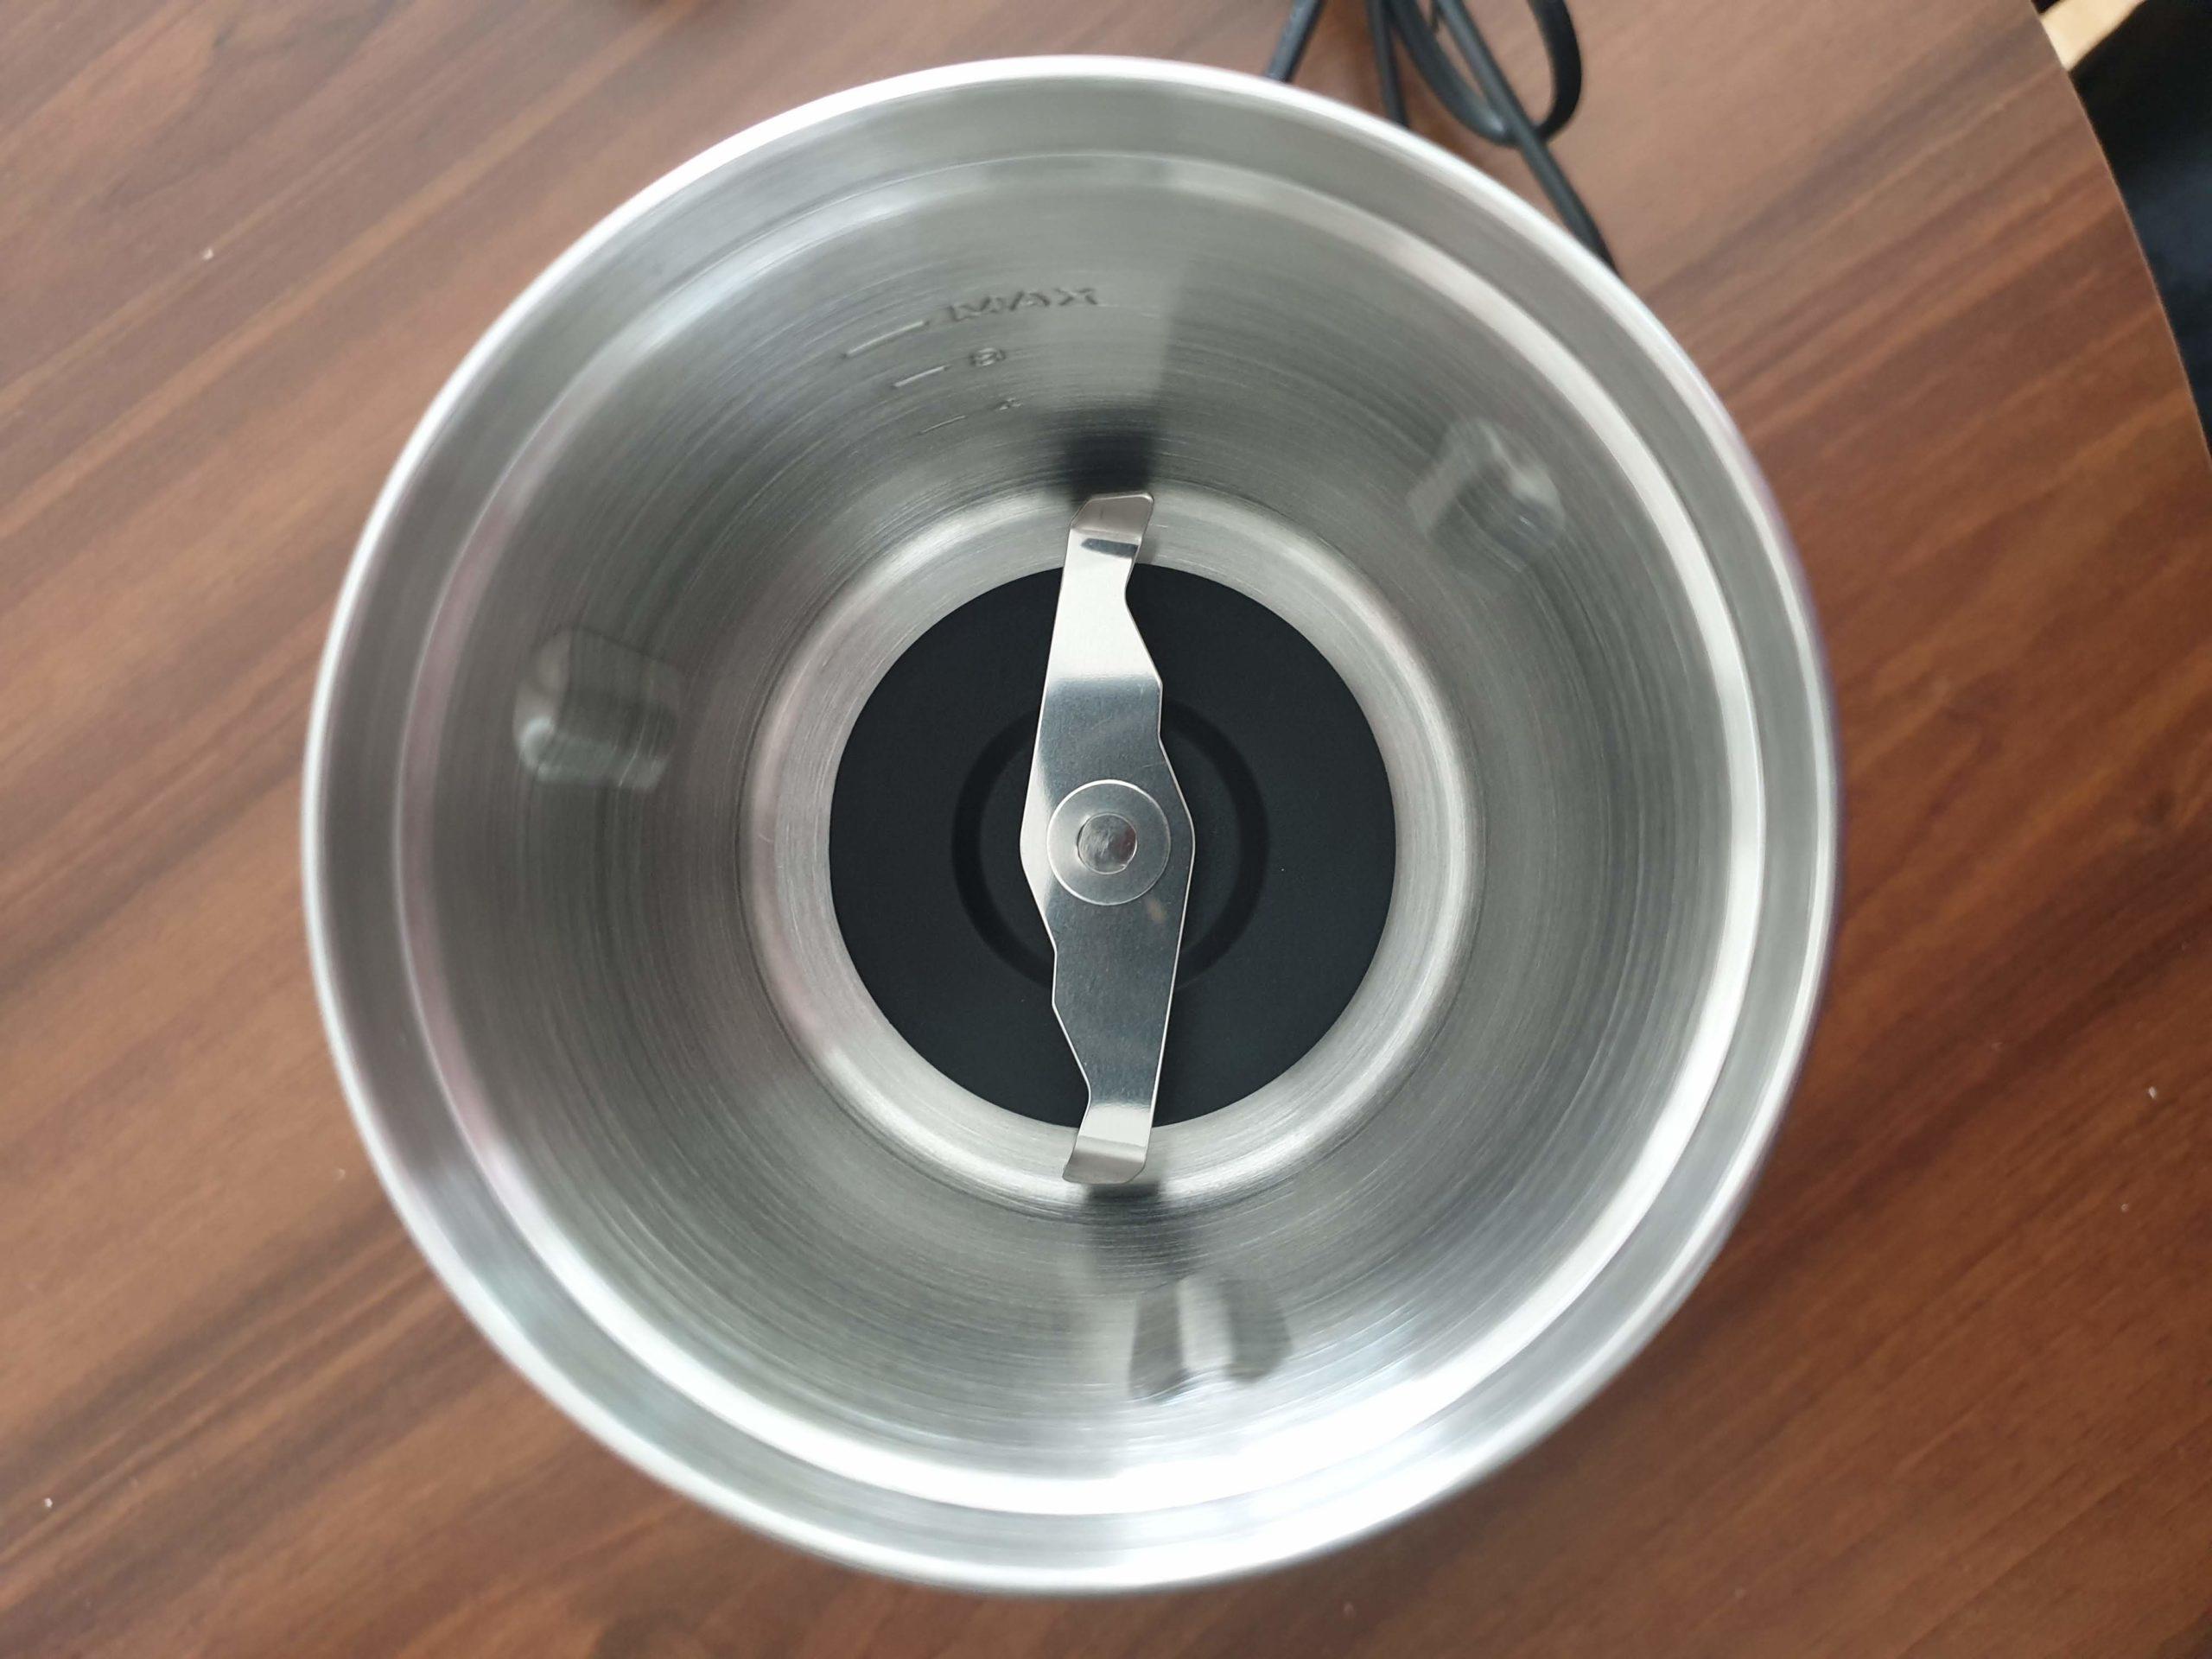 duronic coffee grinder inside bowl